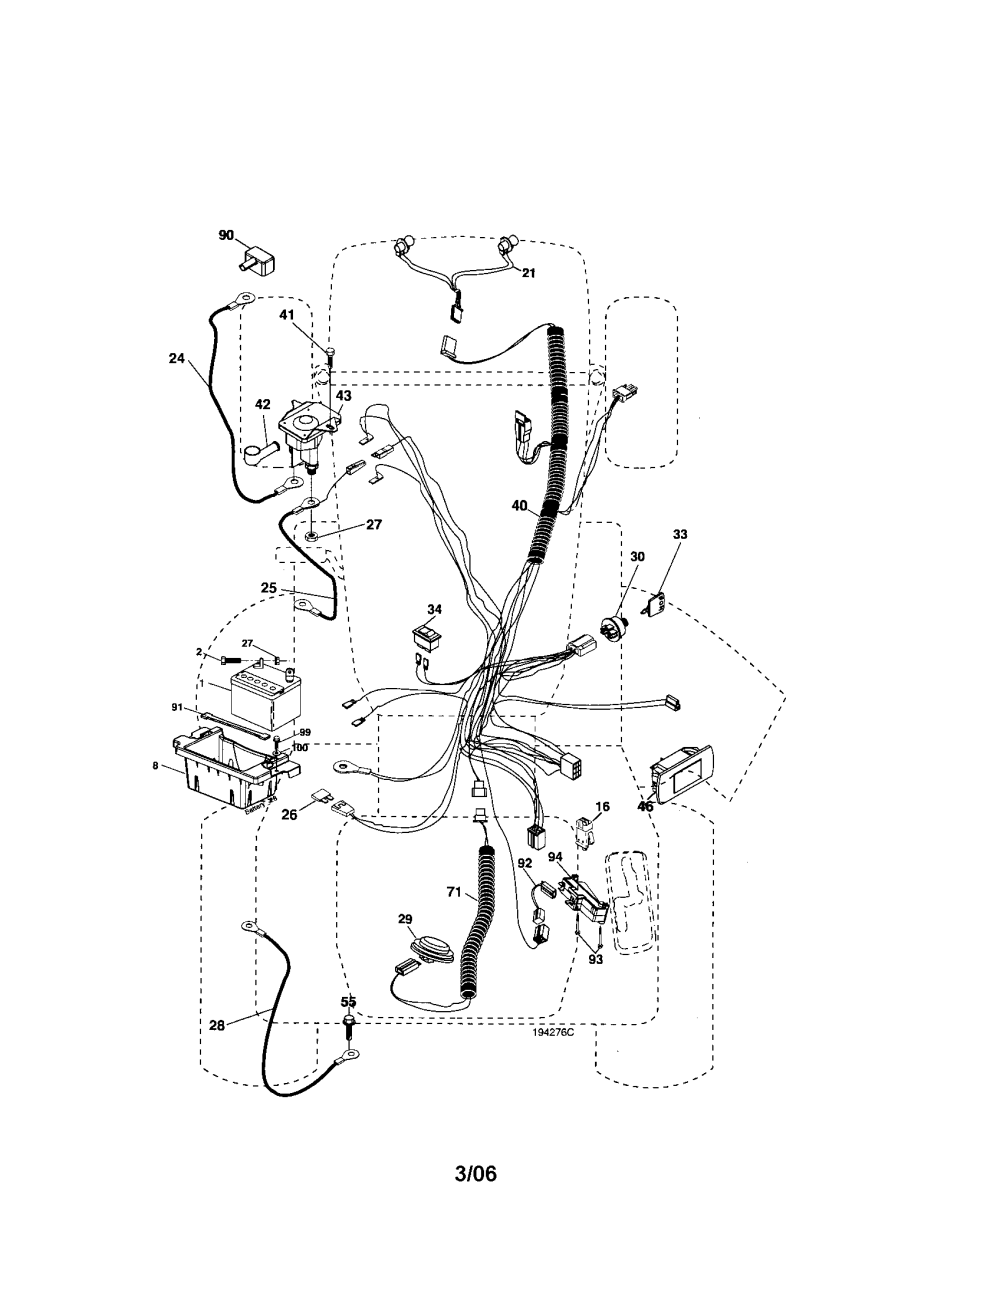 medium resolution of craftsman 917276600 electrical diagram